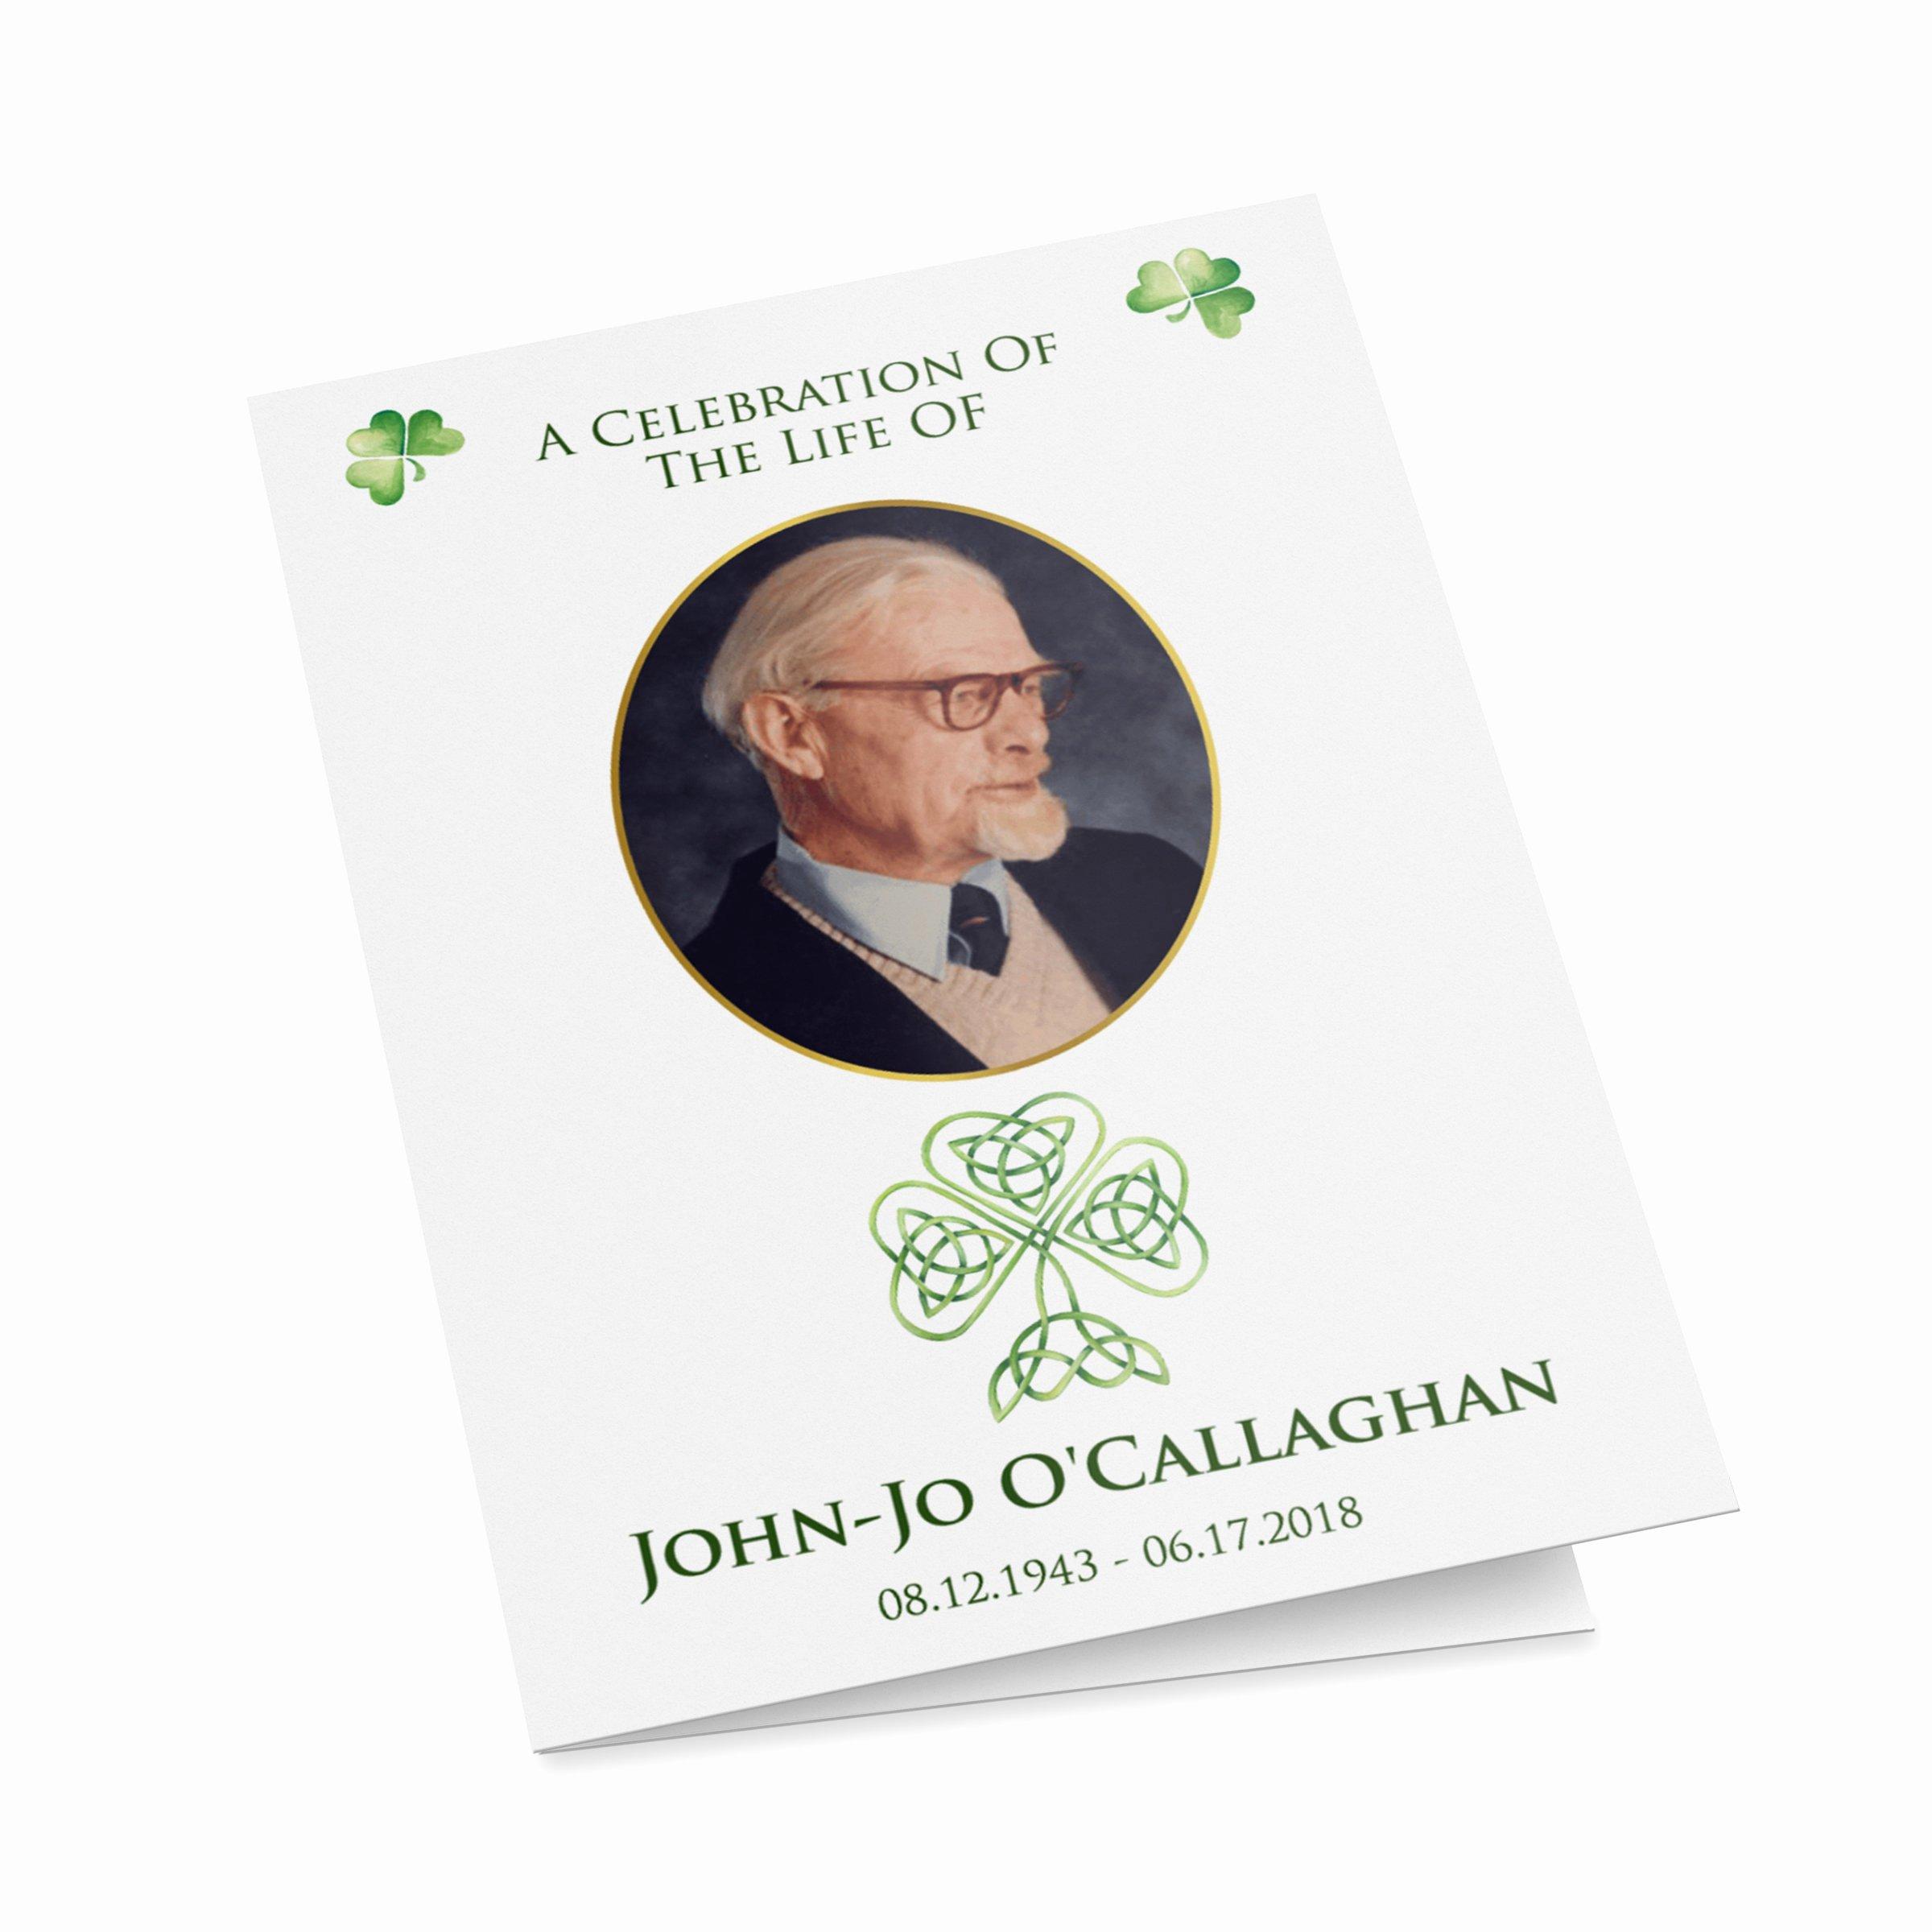 Funeral Mass Program Template Luxury Irish Catholic Funeral Mass Program Template with Shamrocks